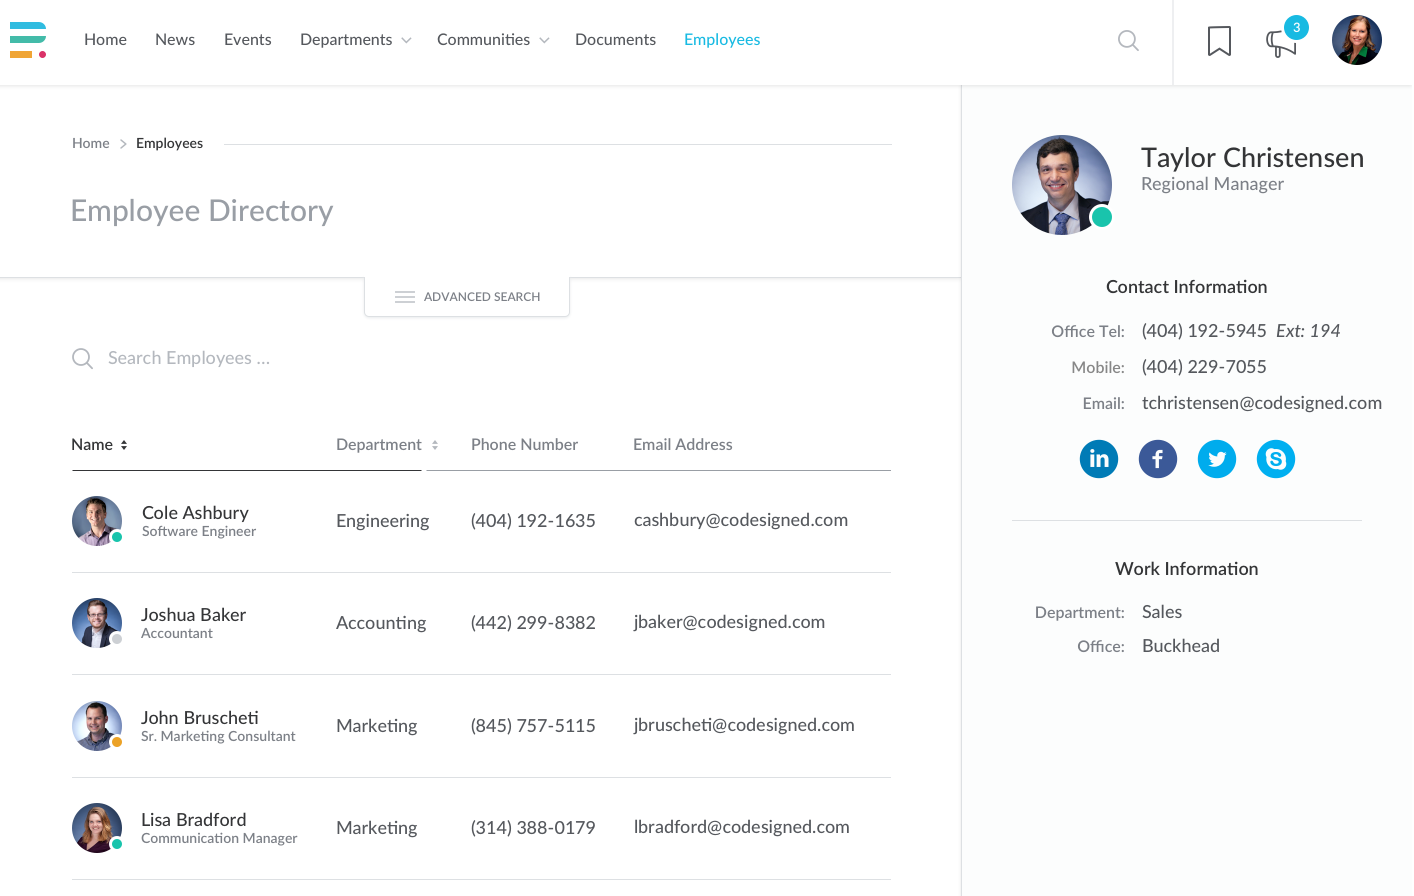 Enterprise Intranet Employee Directory